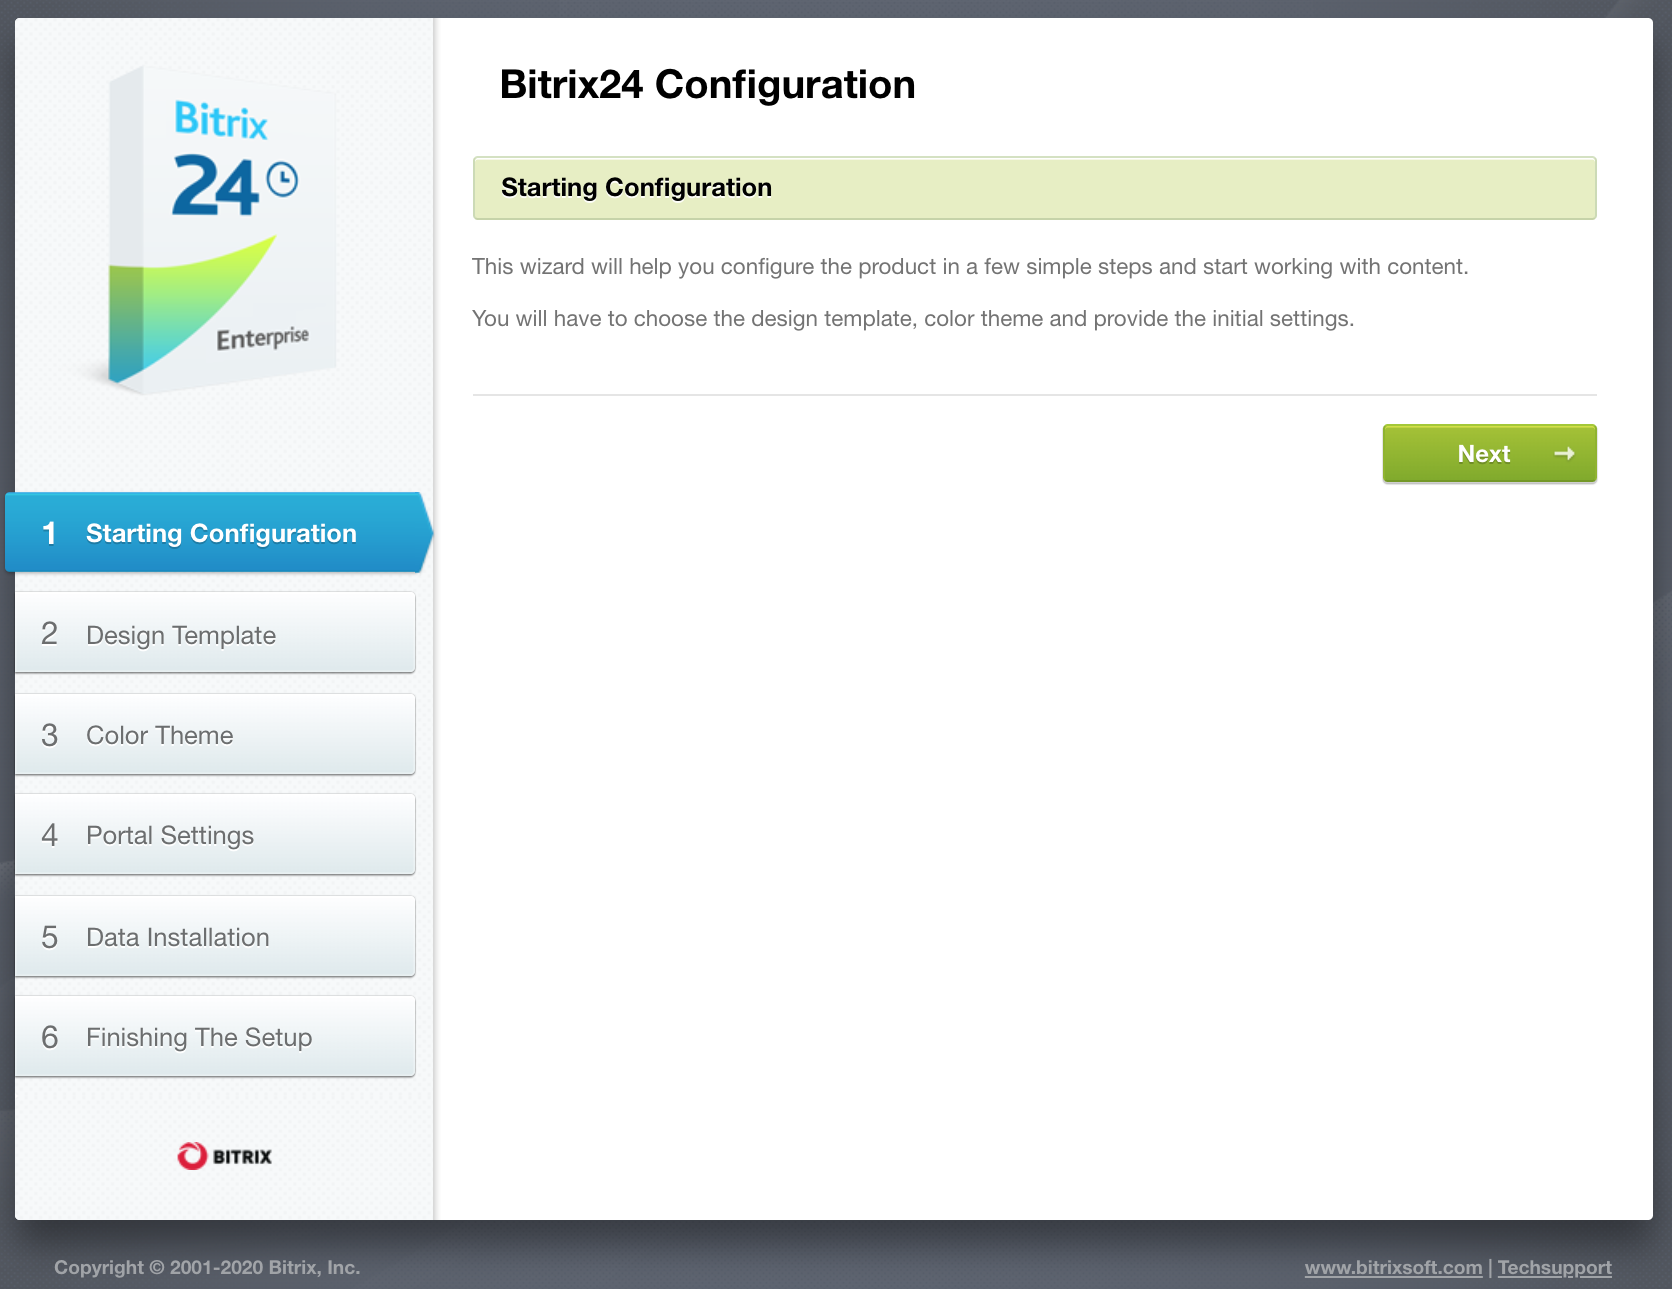 bitrix get settings